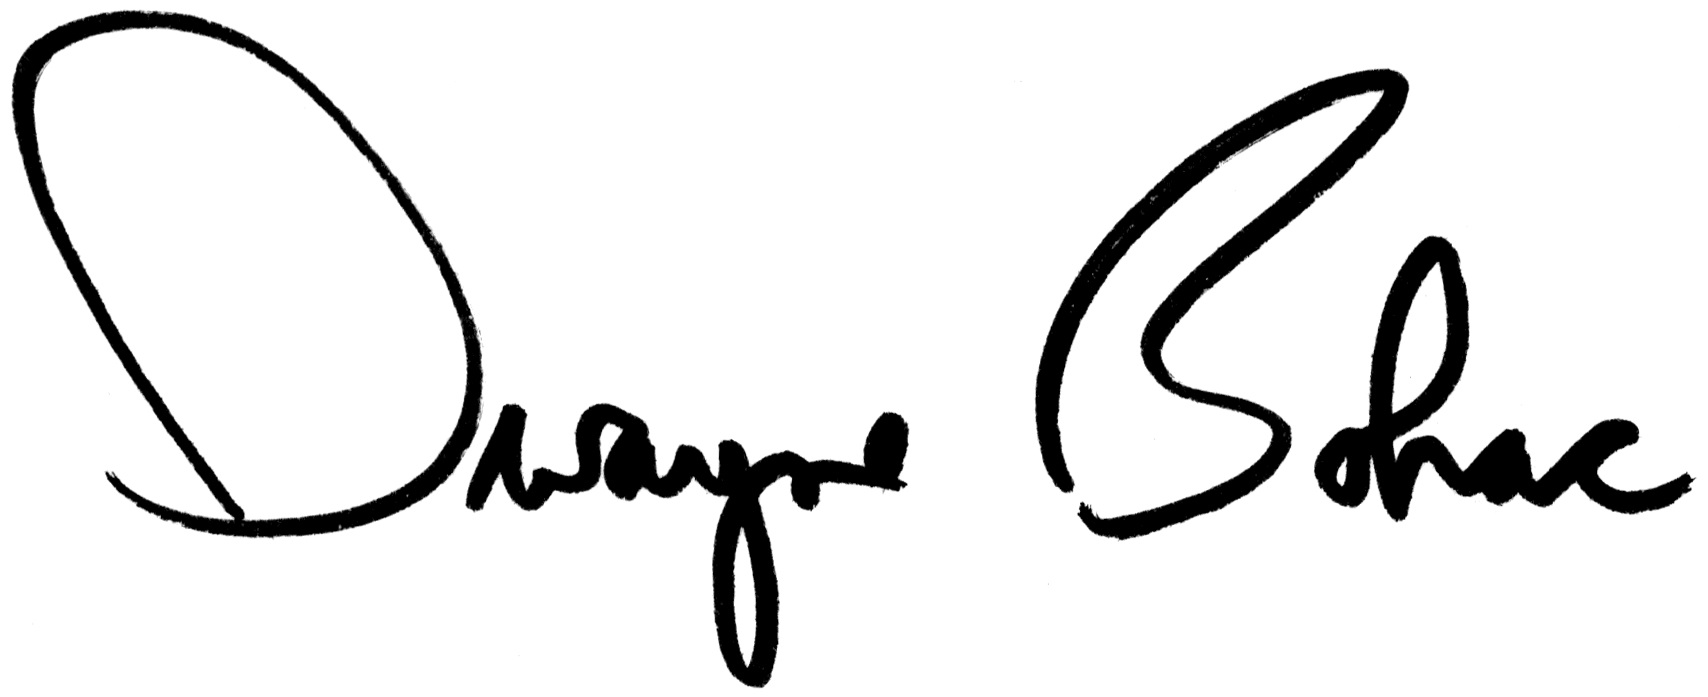 Dwayne Bohac Signature